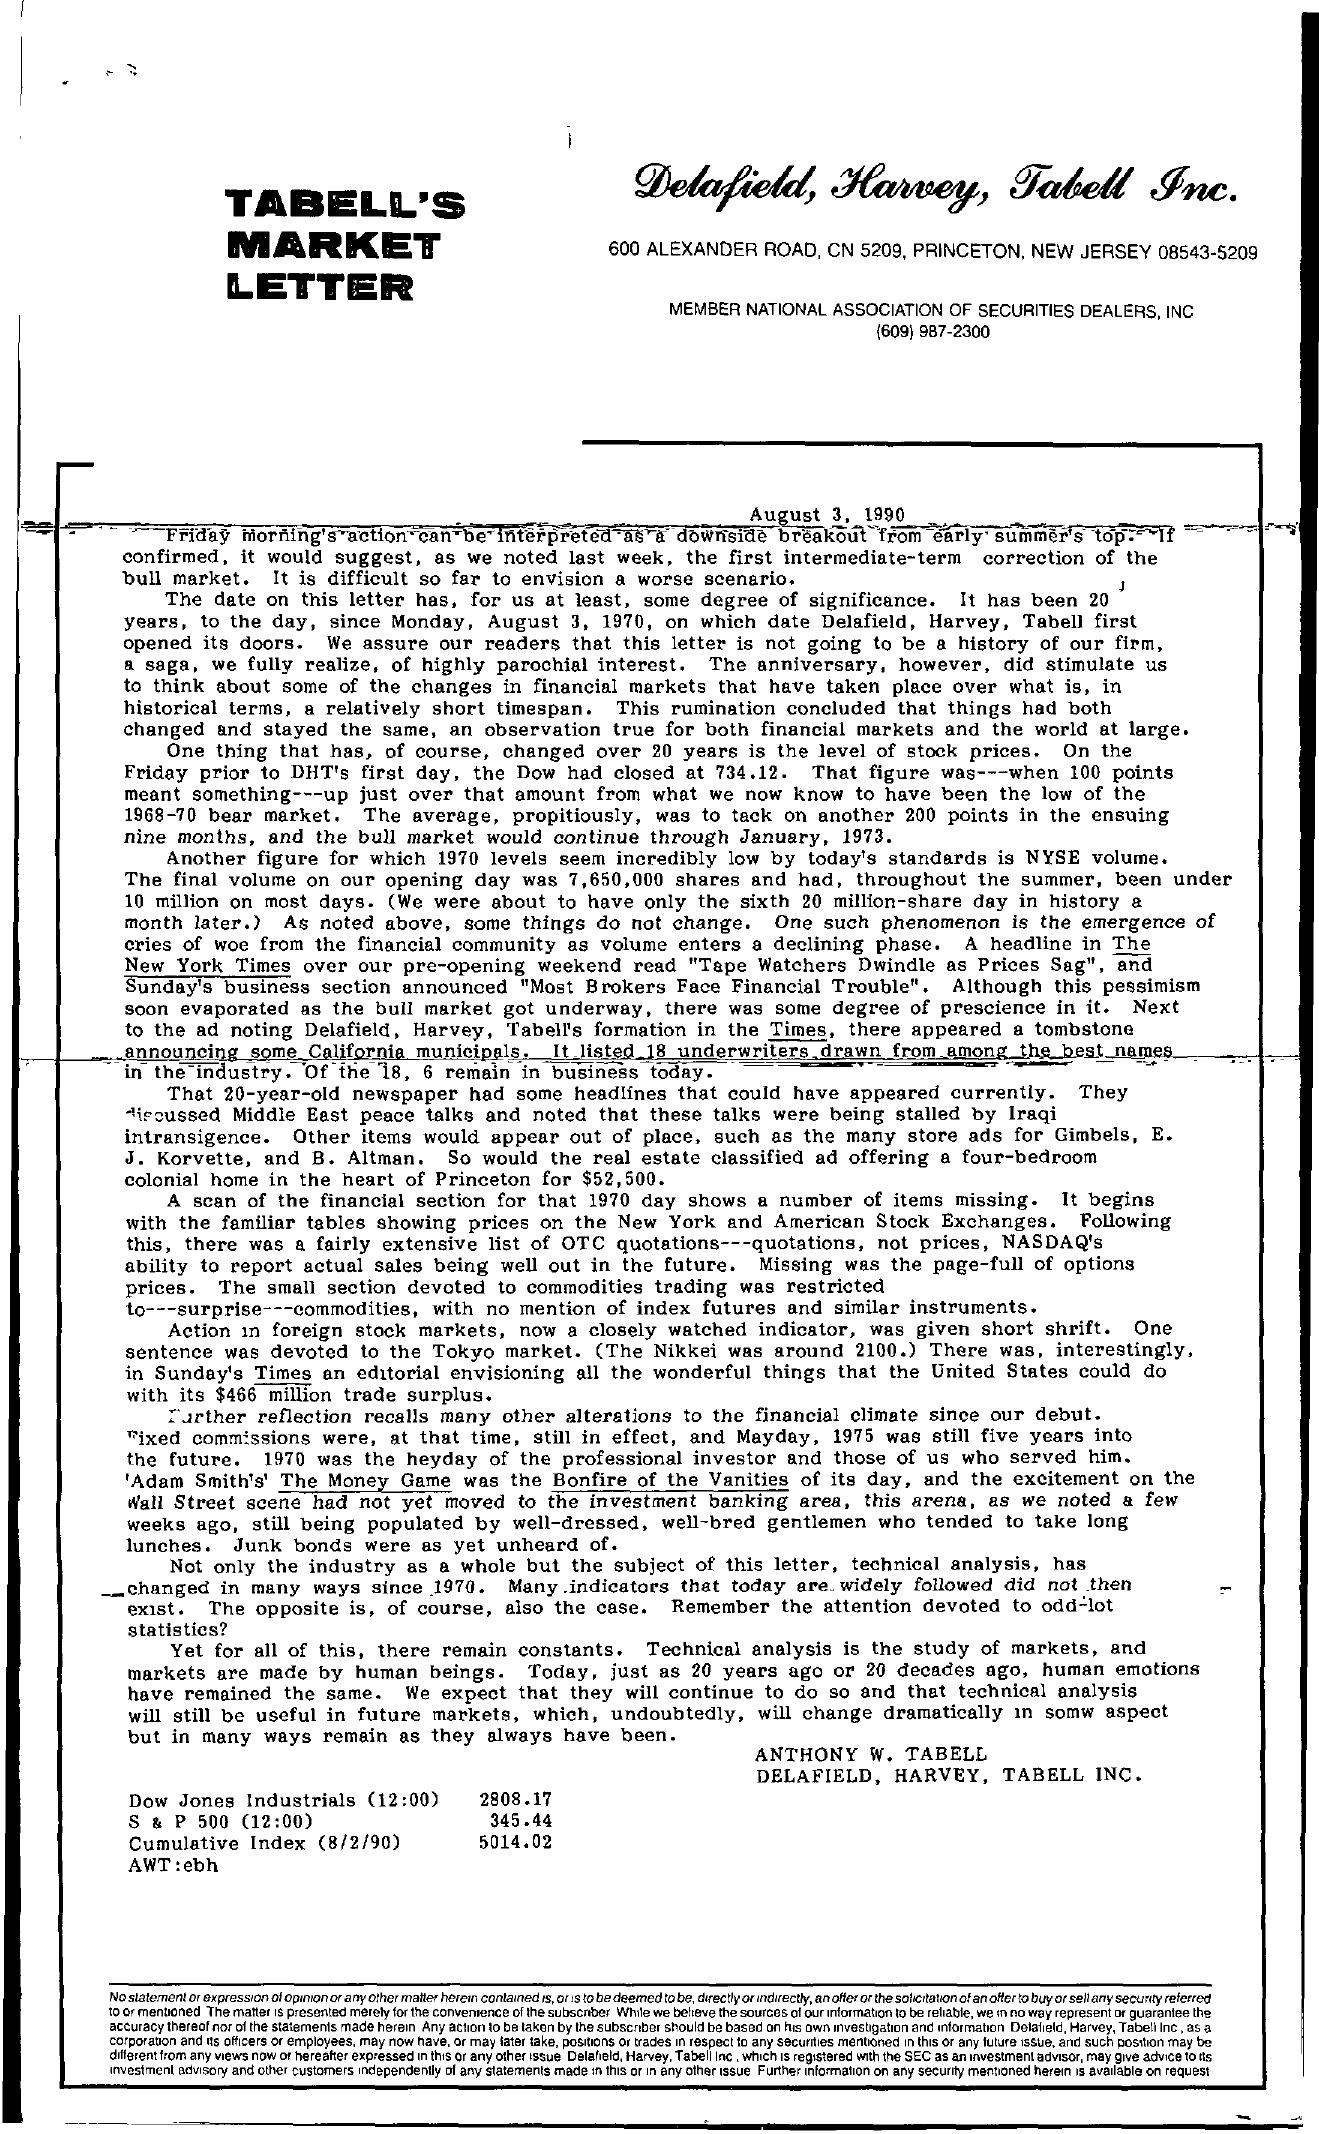 Tabell's Market Letter - August 03, 1990